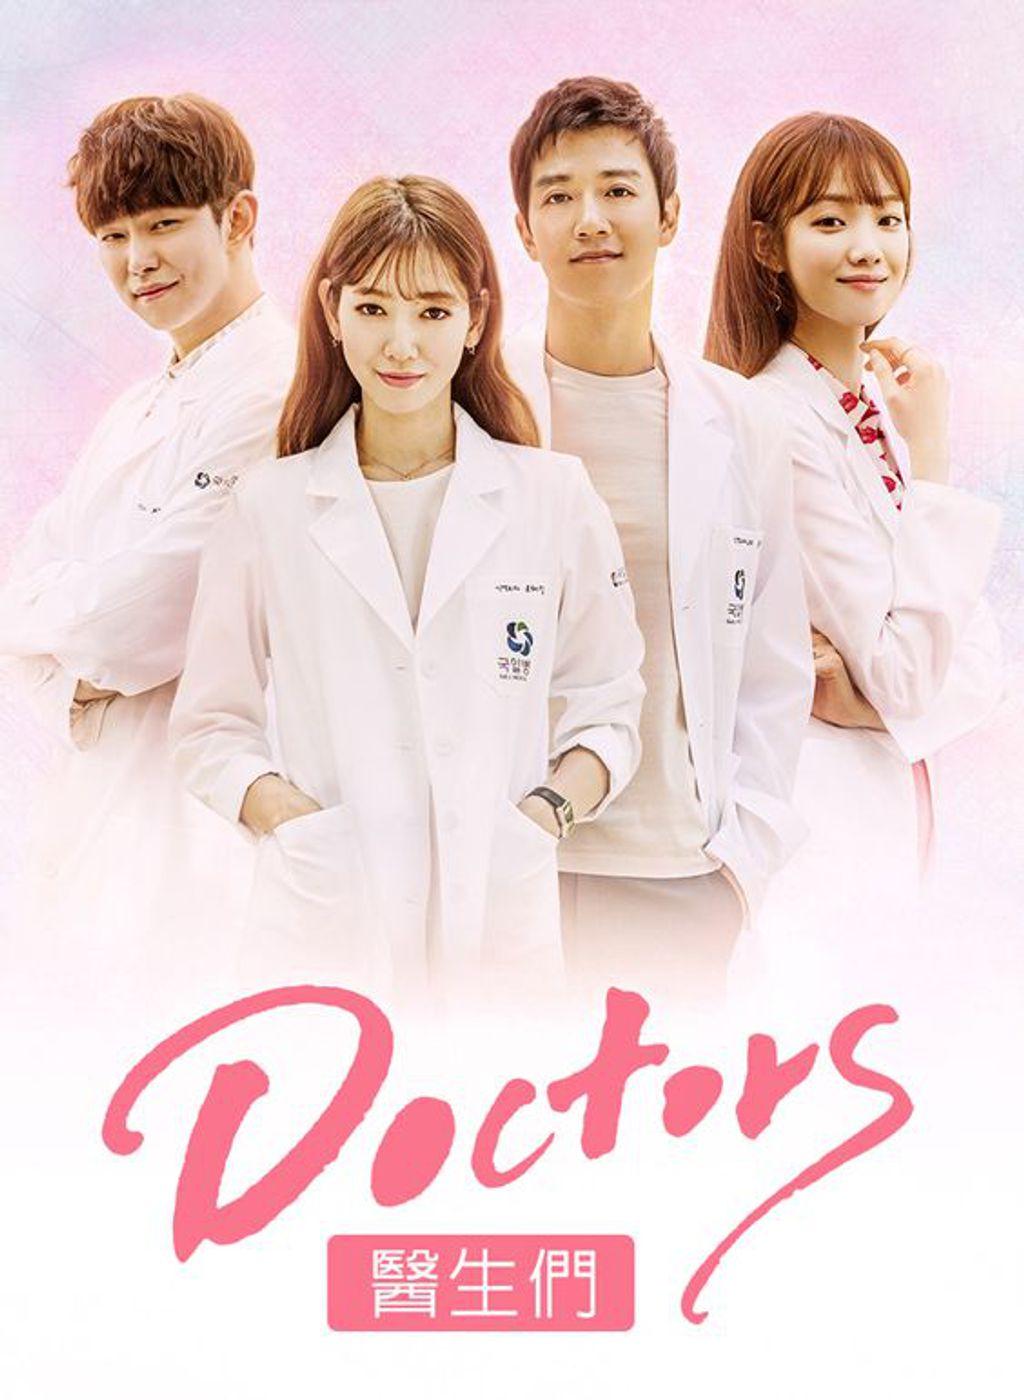 Doctors醫生們第1集 免費線上看 韓劇 LINE TV-精彩隨看